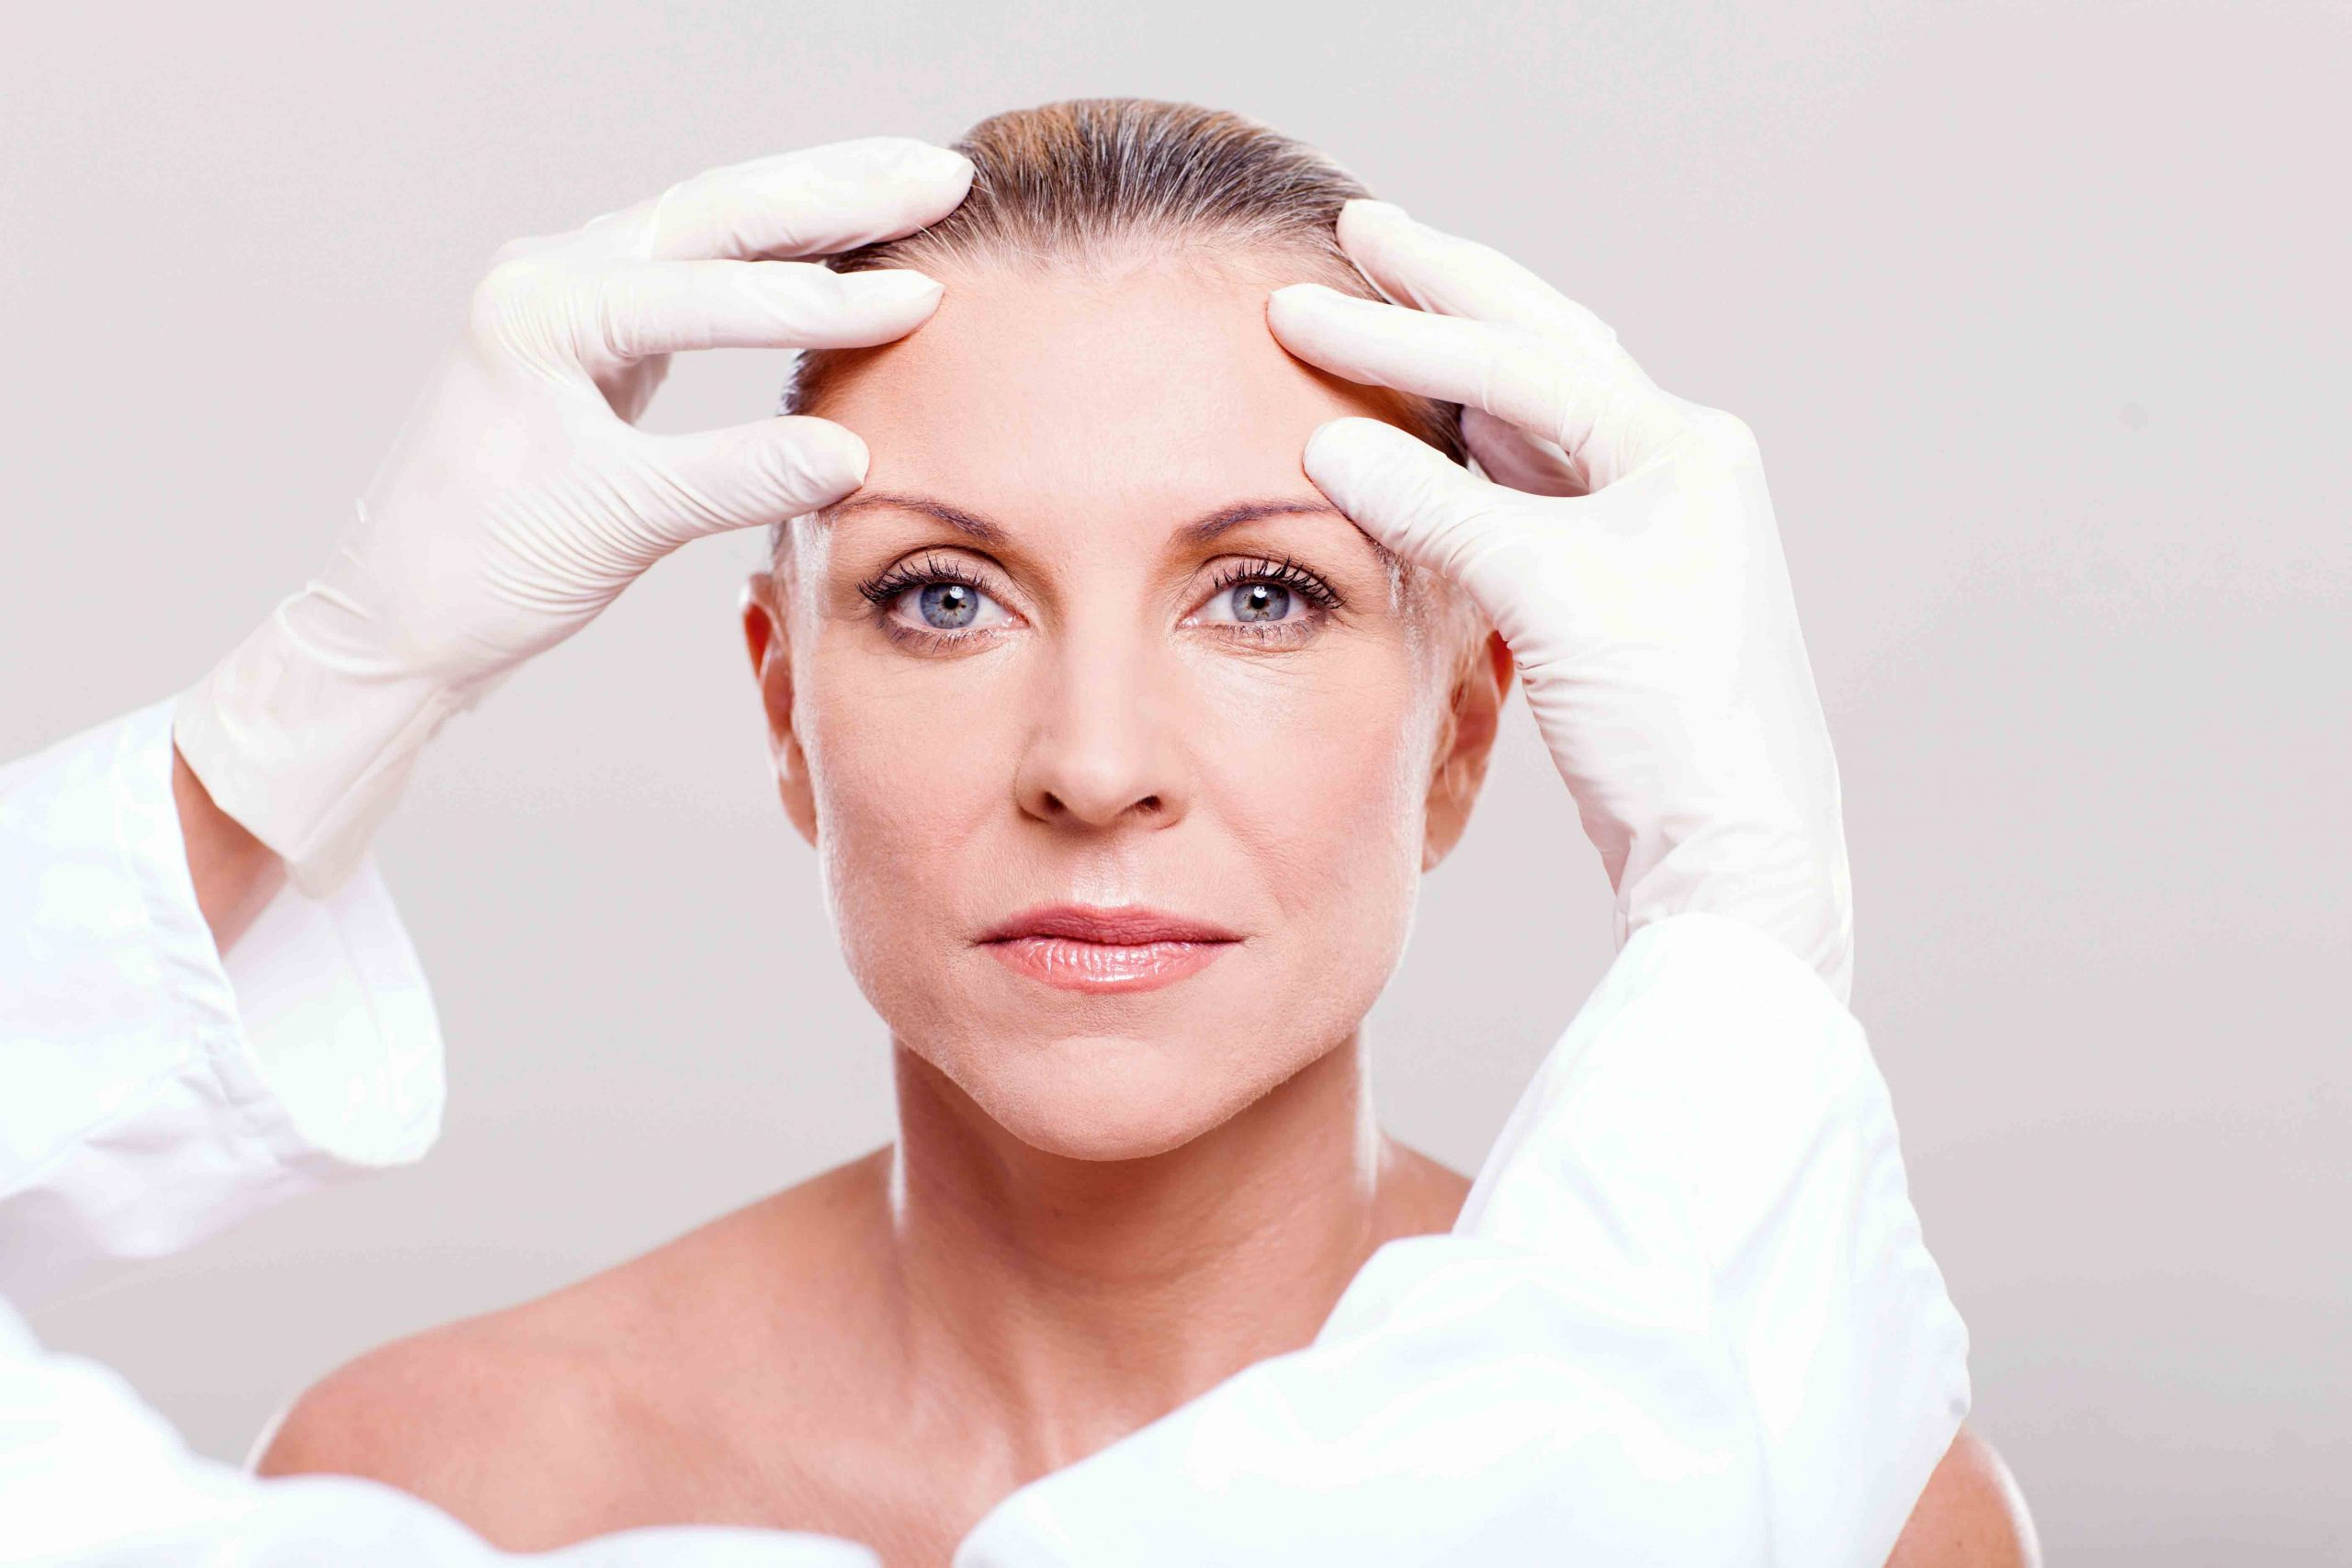 Augenlidstraffung, Tränensäcke entfernen - effektiv, schmerzfrei I Dr. Zierhofer-Tonar Wien